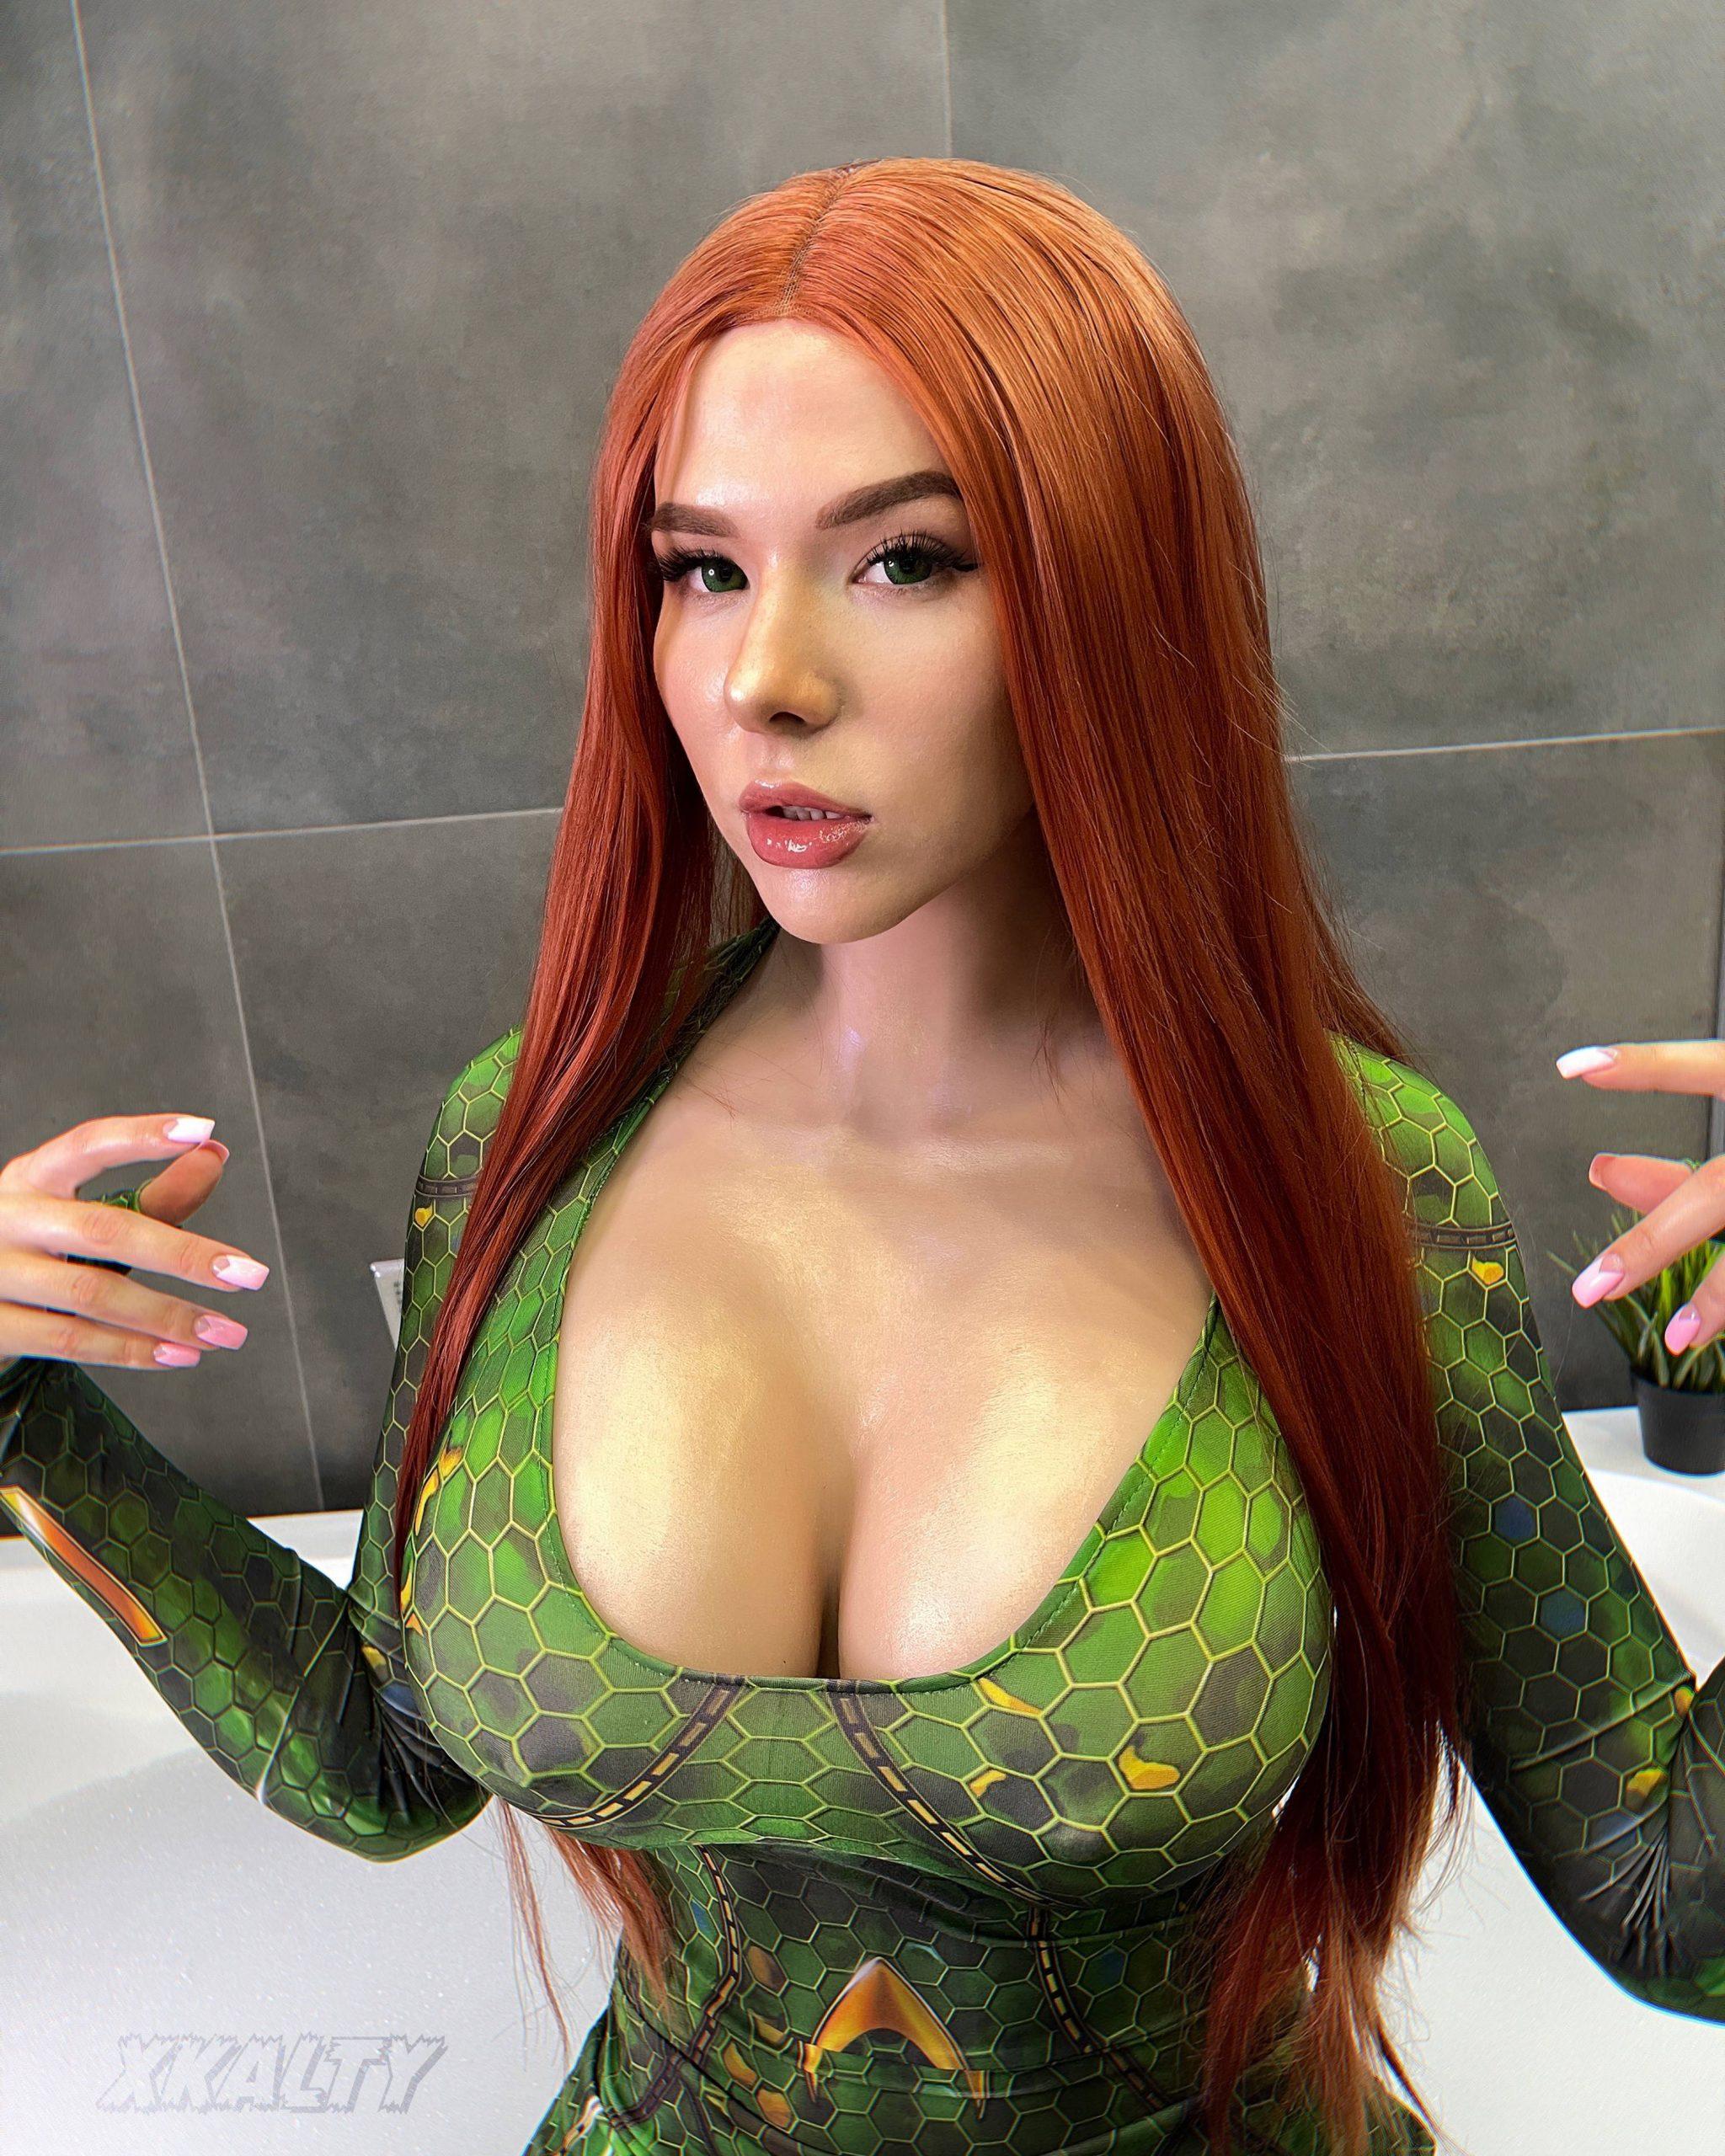 Mera From Aquaman – By Xkalty